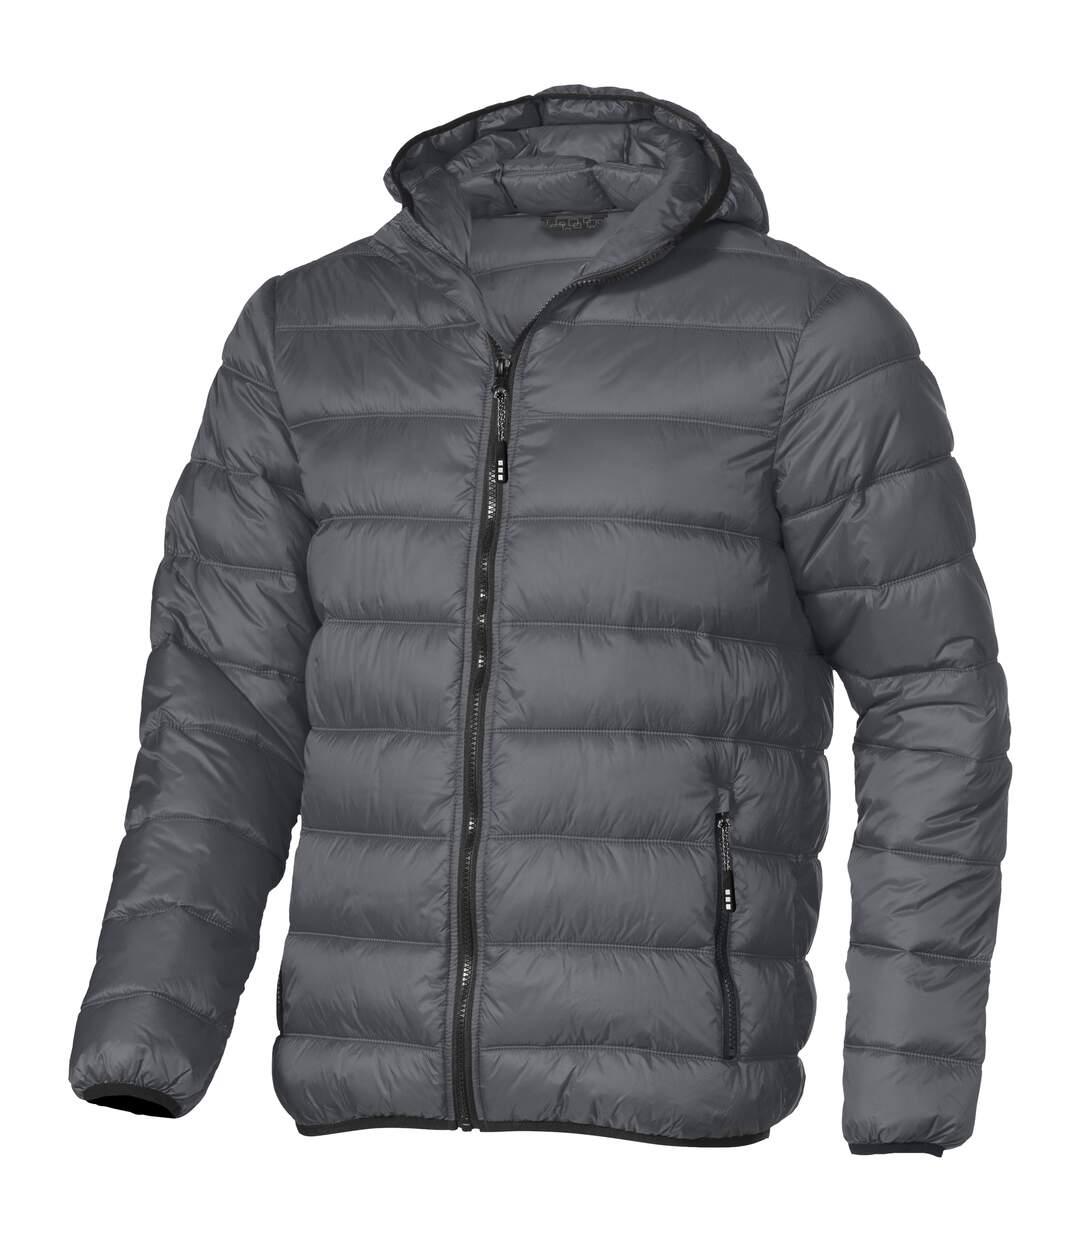 Elevate Mens Norquay Insulated Jacket (Steel Grey) - UTPF1916